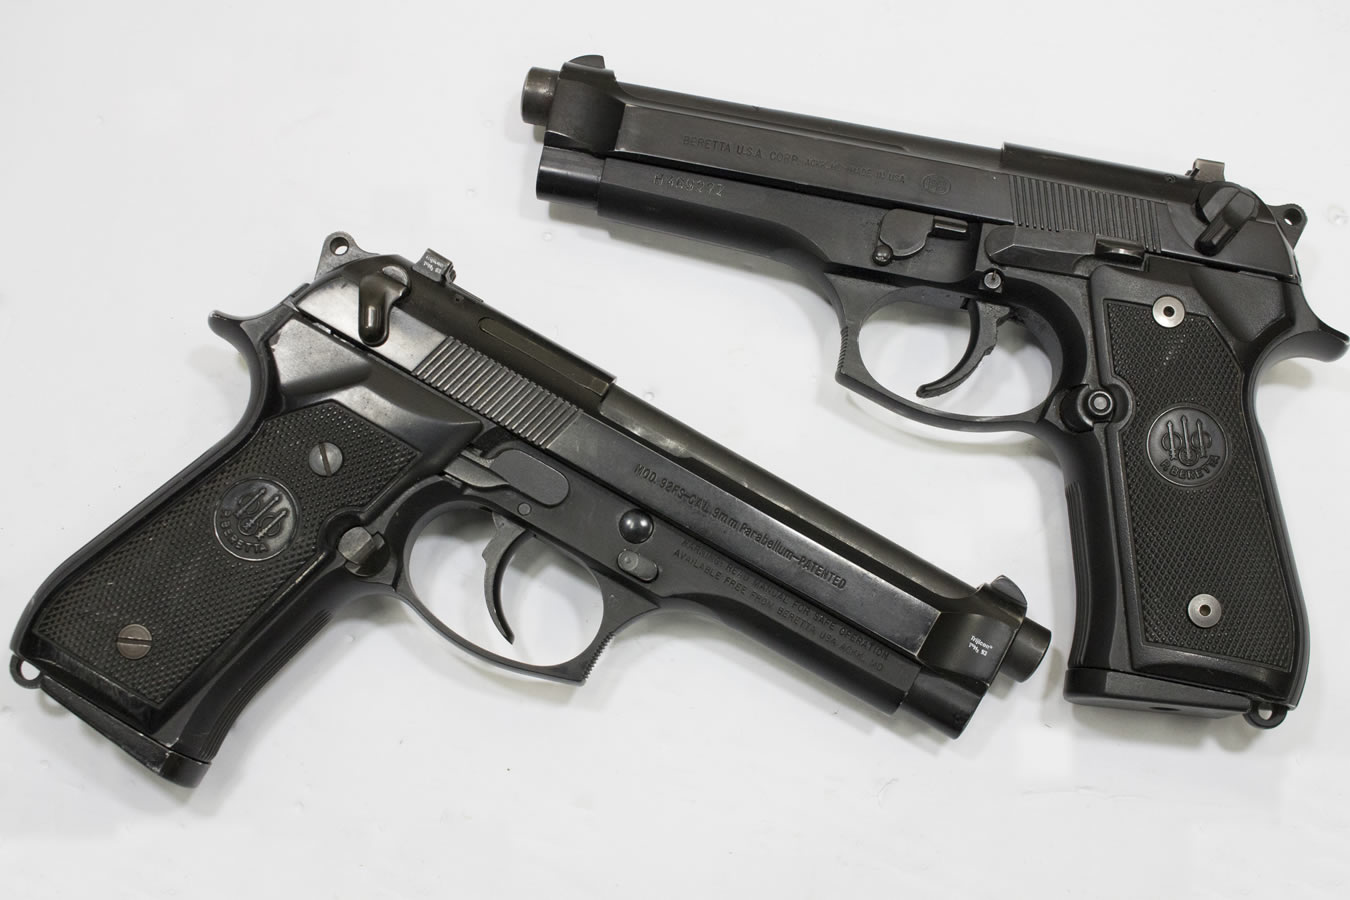 100+ Used Beretta 92fs Compact – yasminroohi